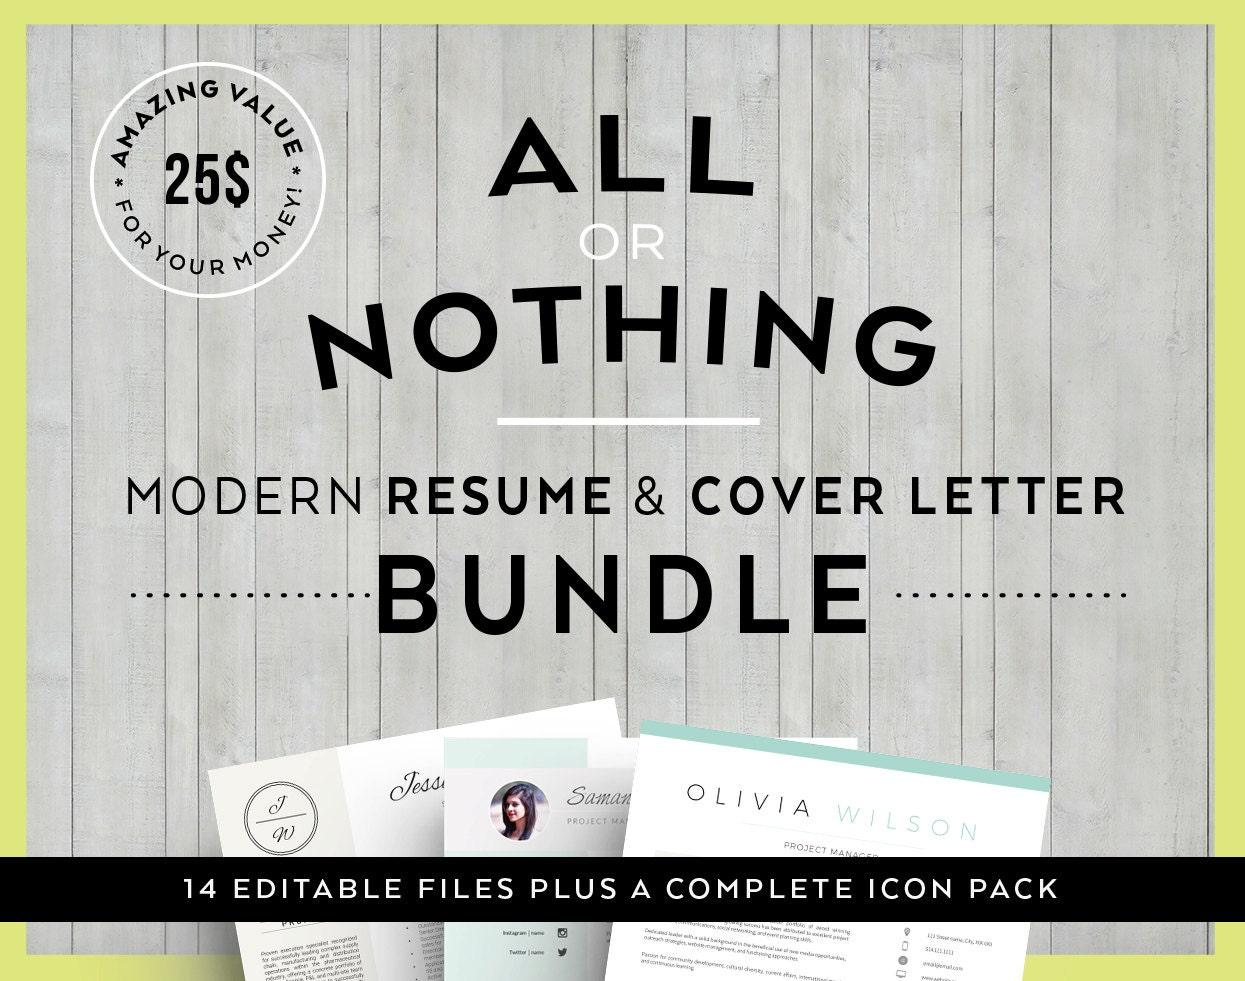 Value offer bundle modern resume cover letter template zoom spiritdancerdesigns Image collections